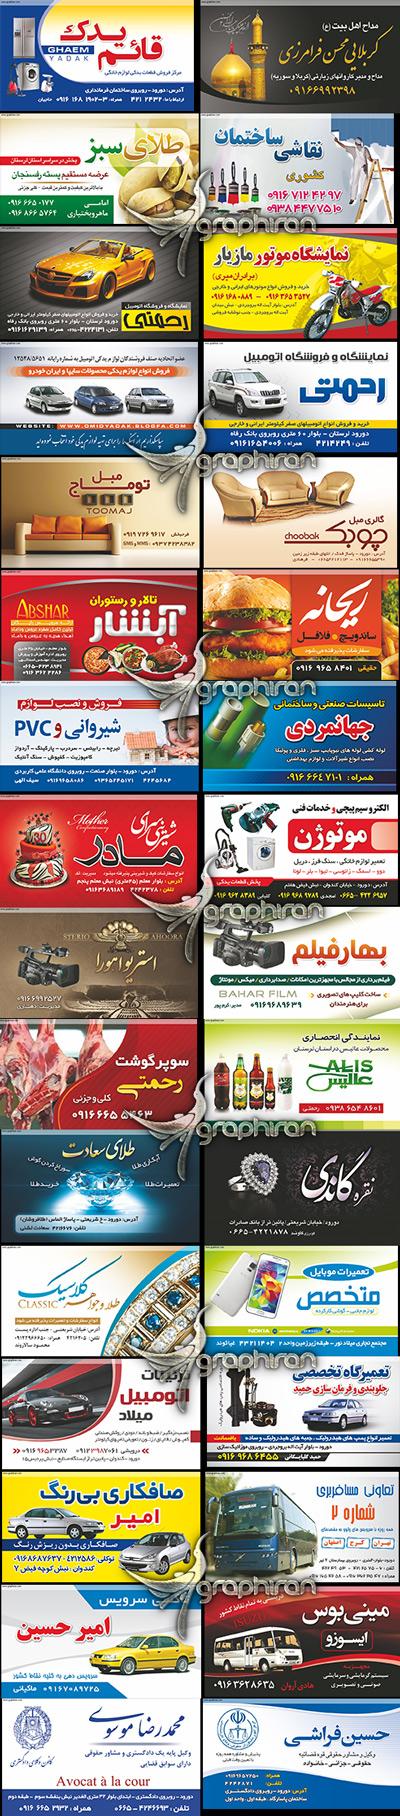 نمونه کارت ویزیت ایرانی